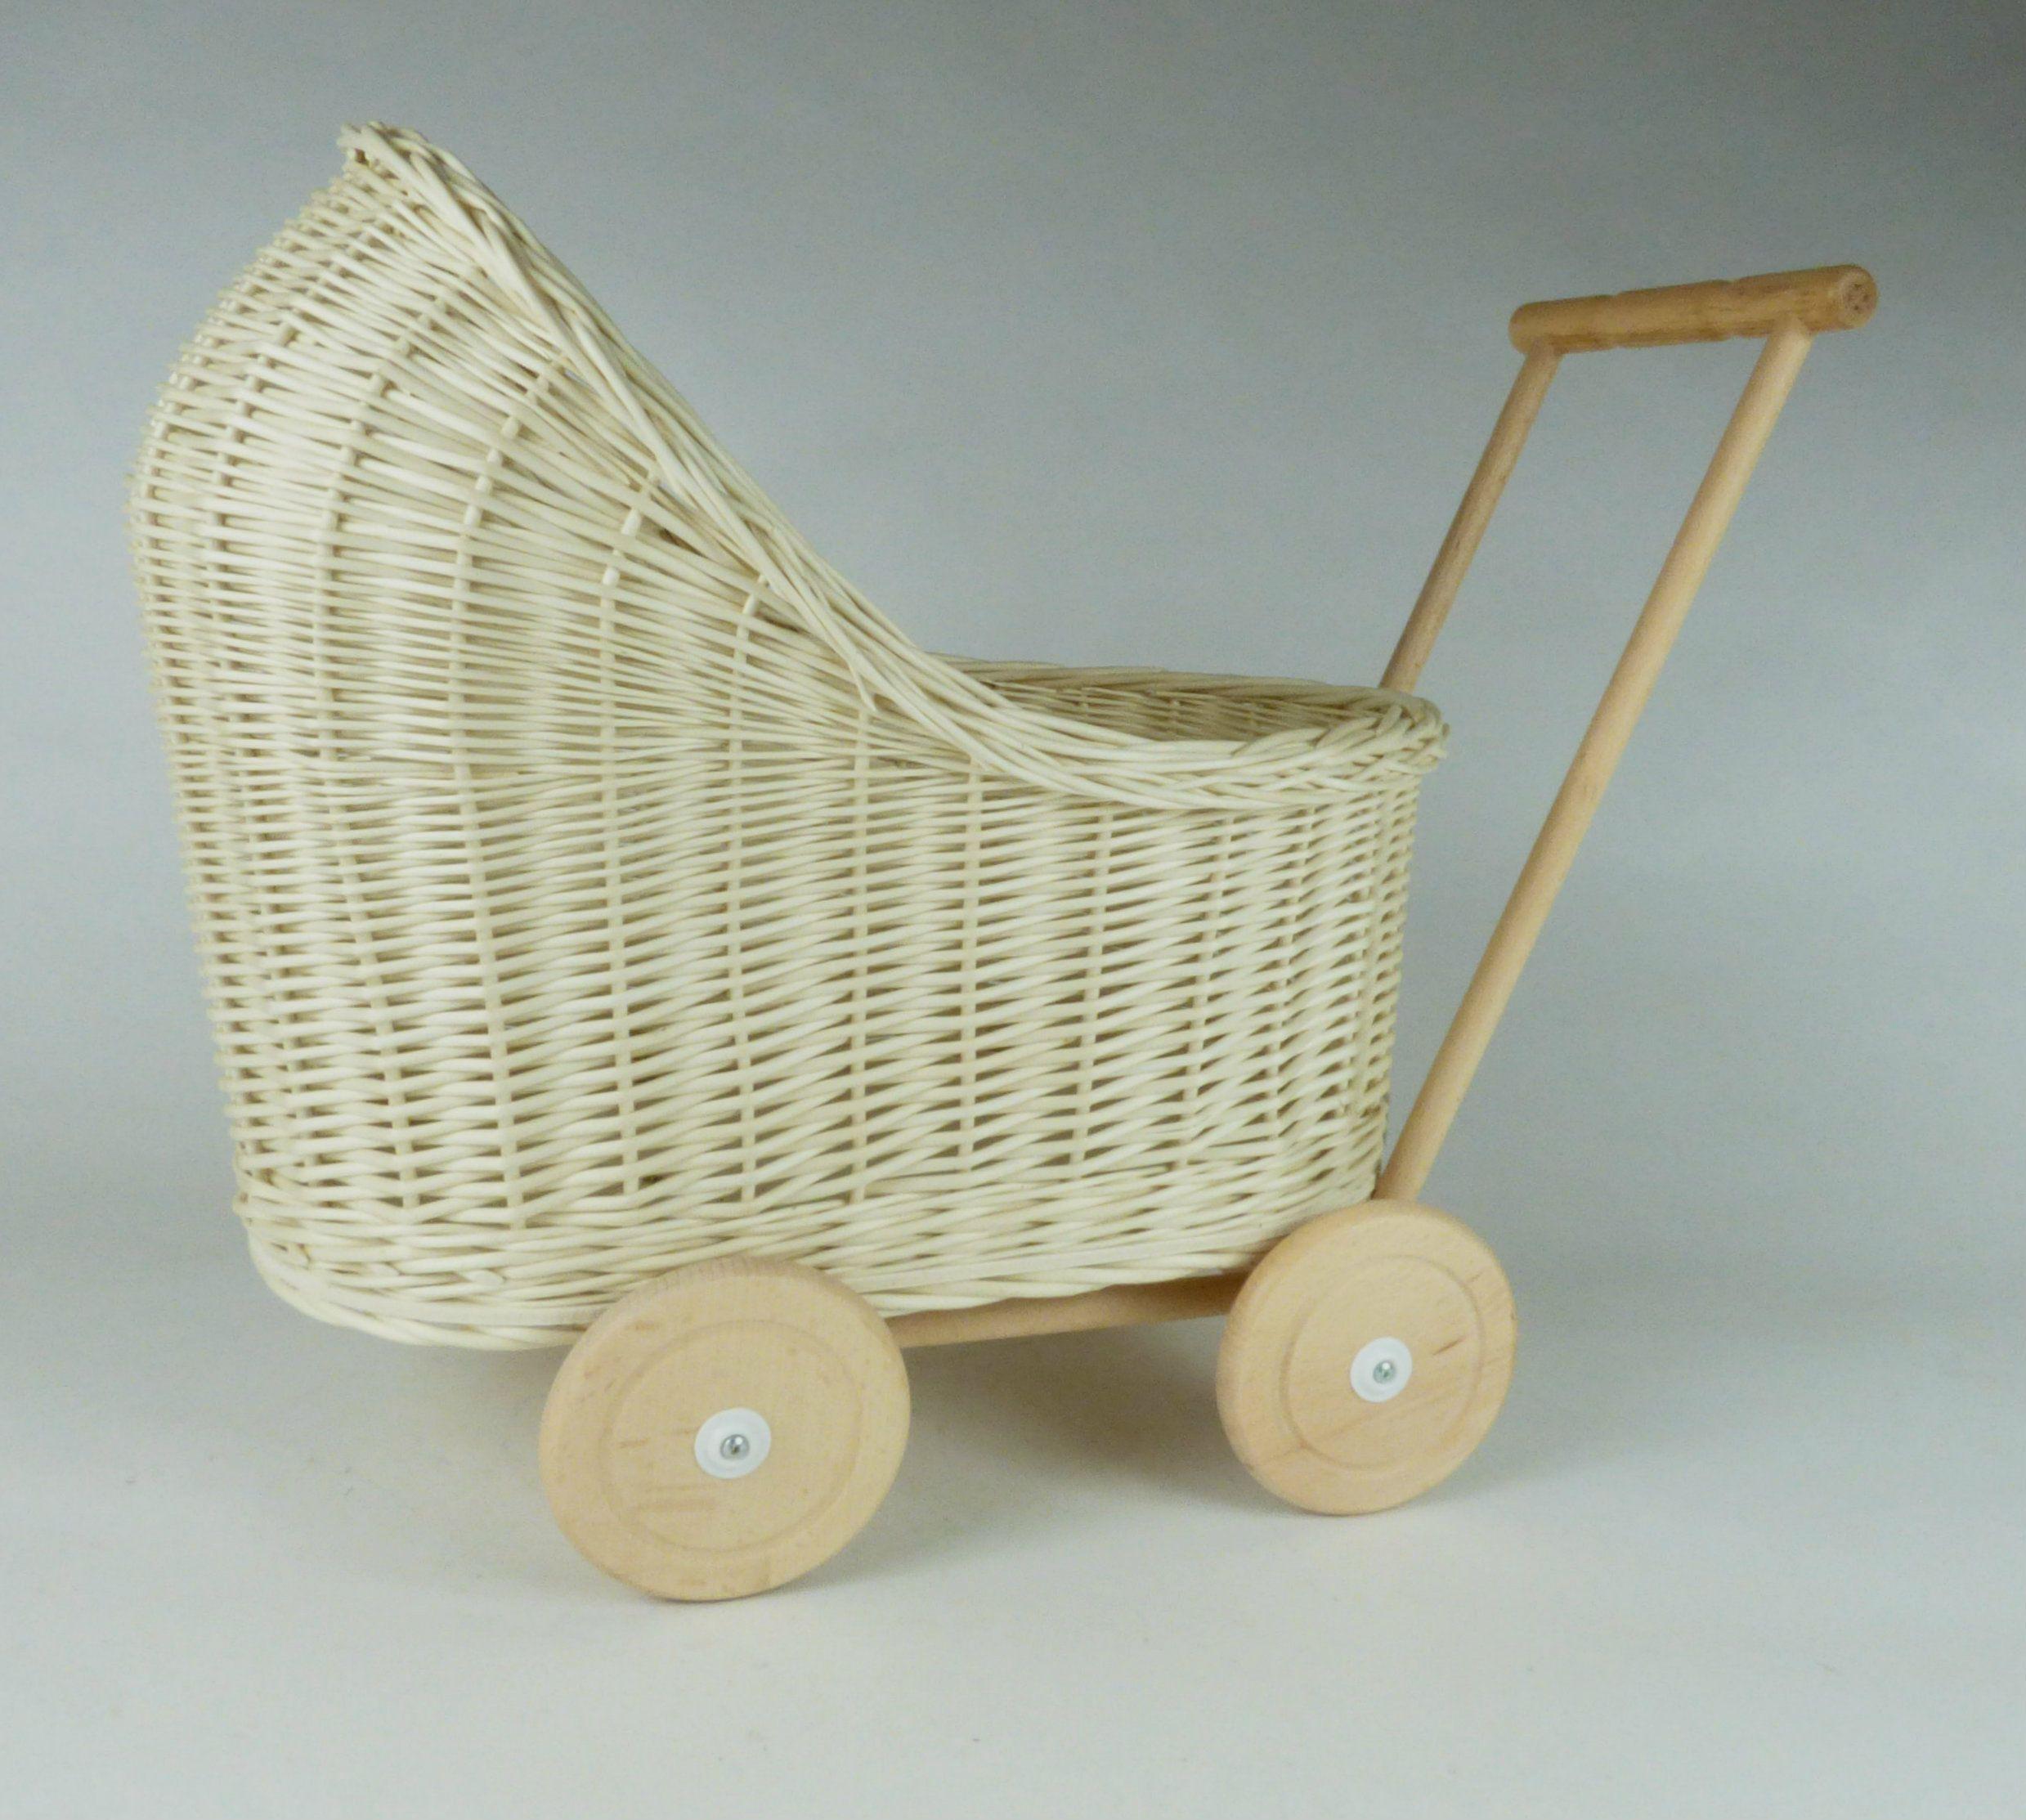 Wiklibox natural wicker & wood doll stroller in ECRU